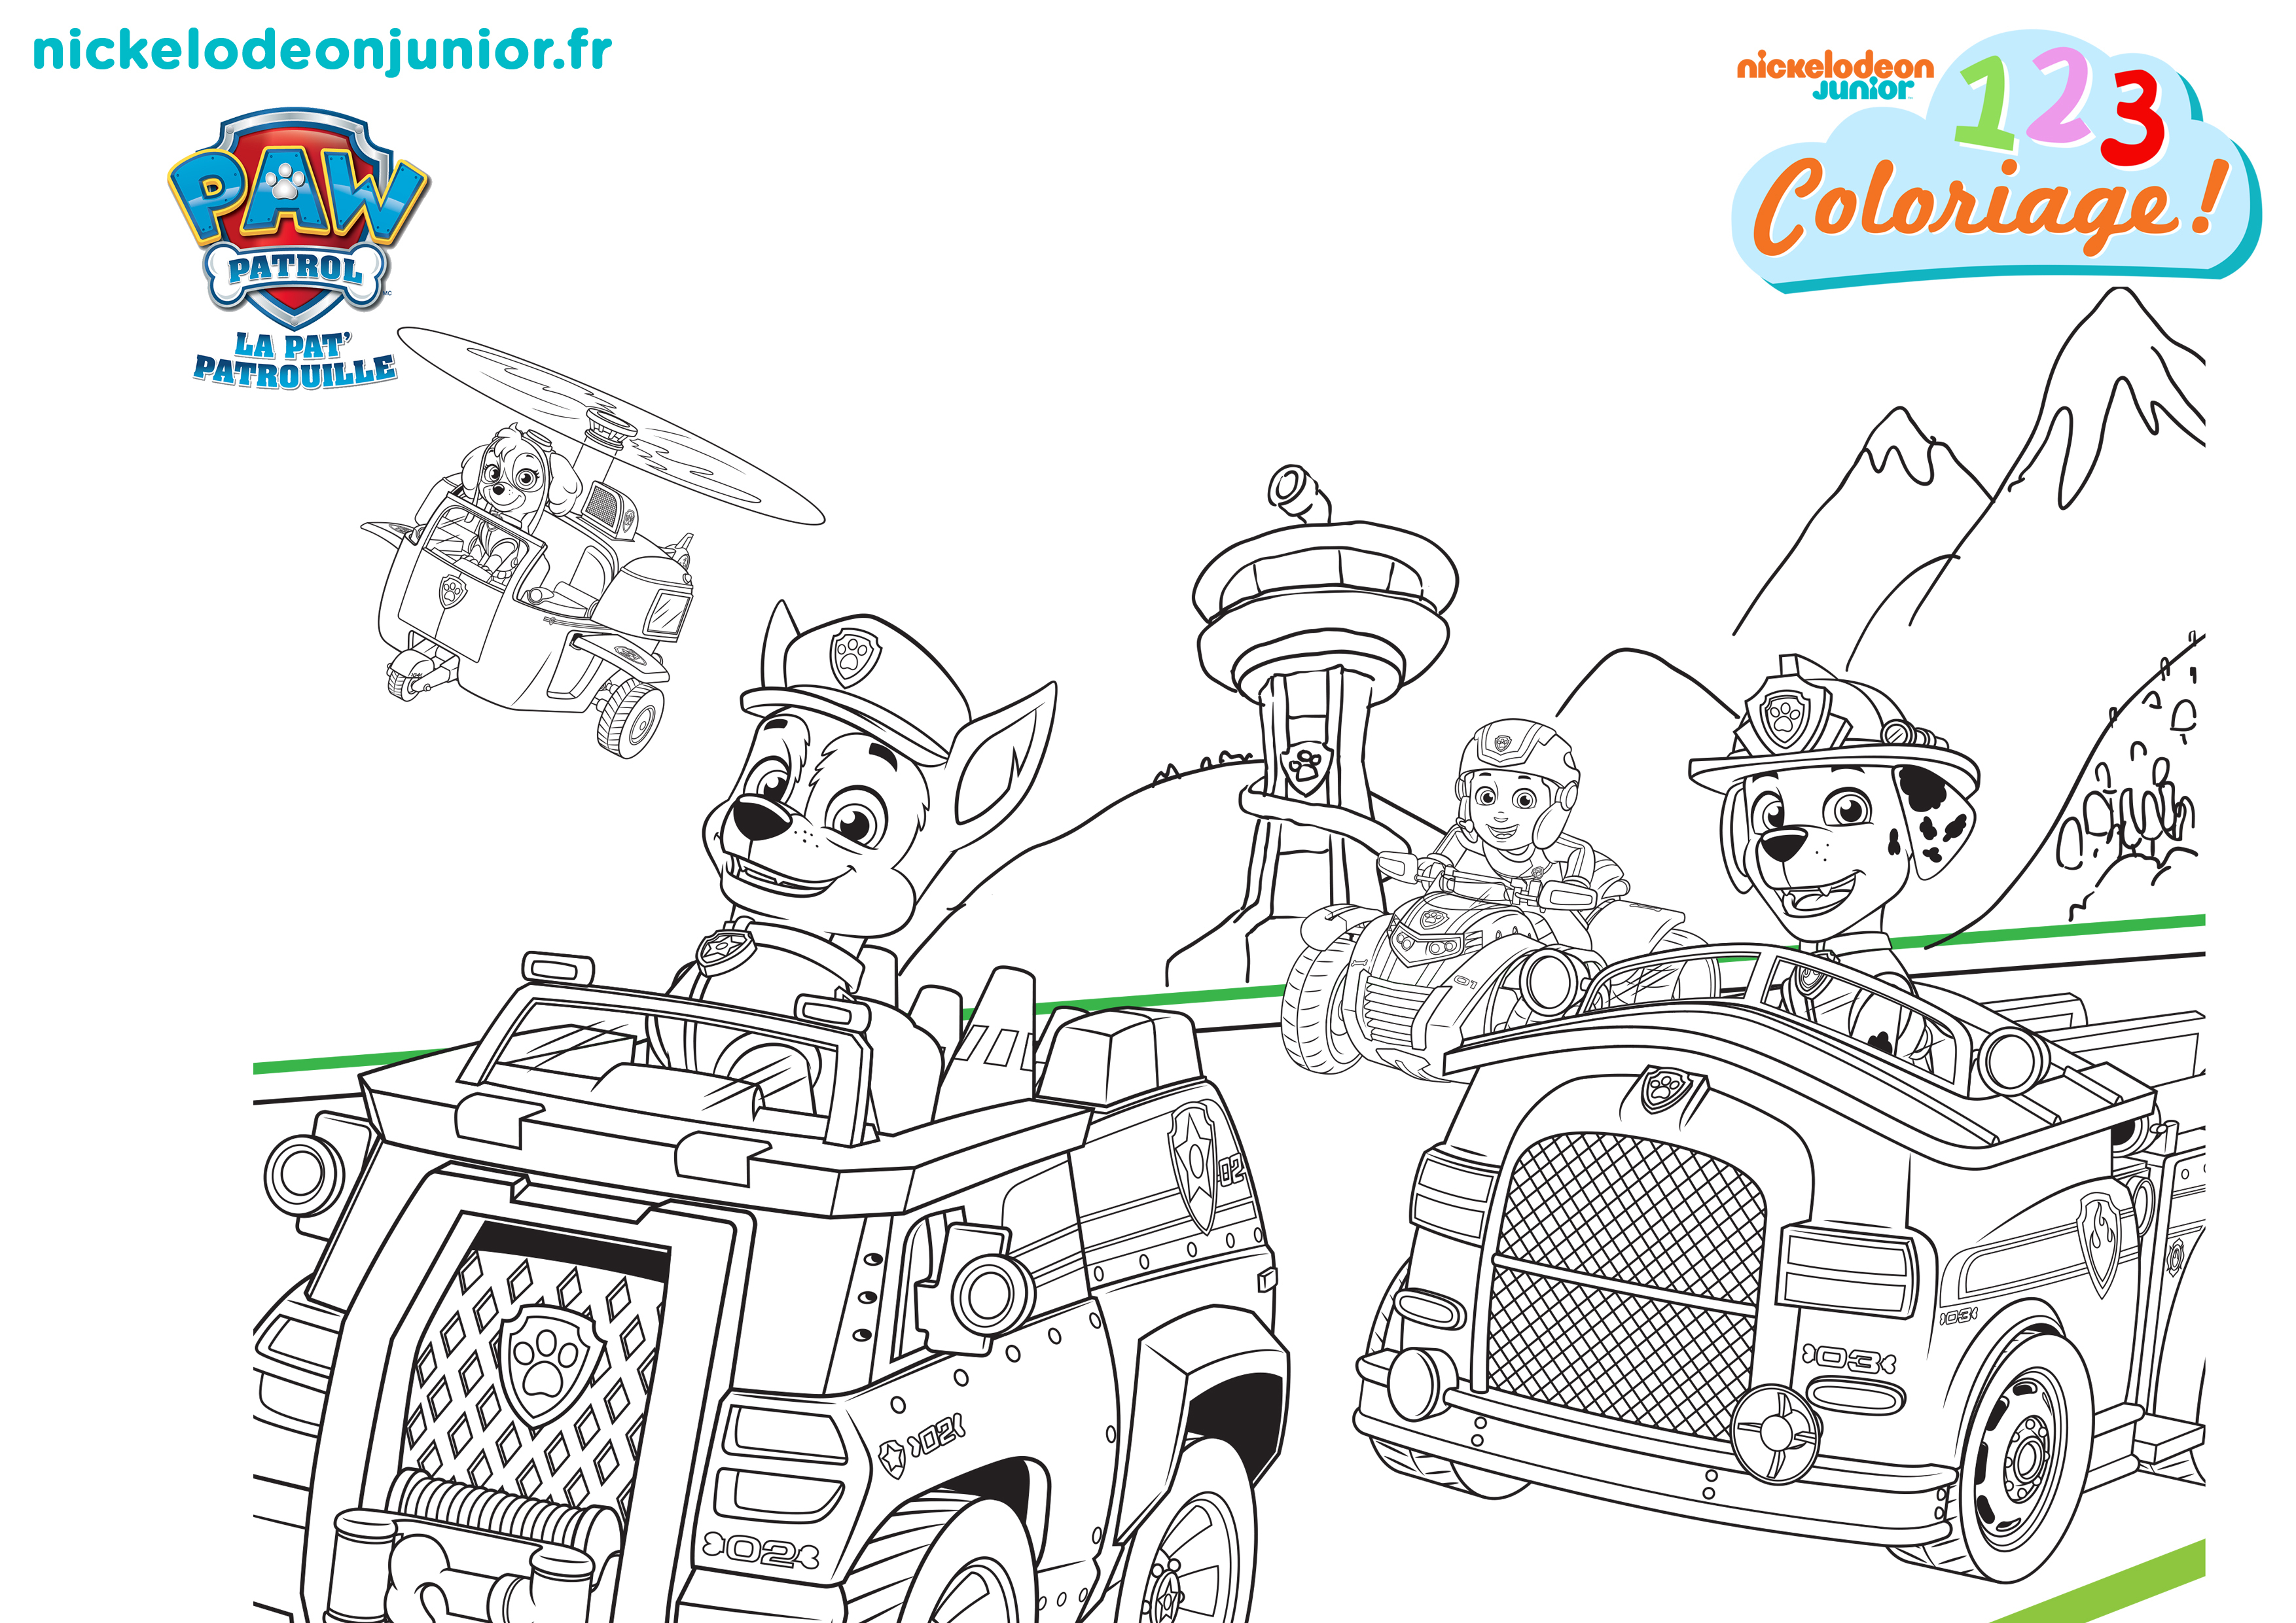 1, 2, 3 Coloriage ! | Paw Patrol : La Pat'Patrouille encequiconcerne Coloriage Pat Patrouille A Imprimer